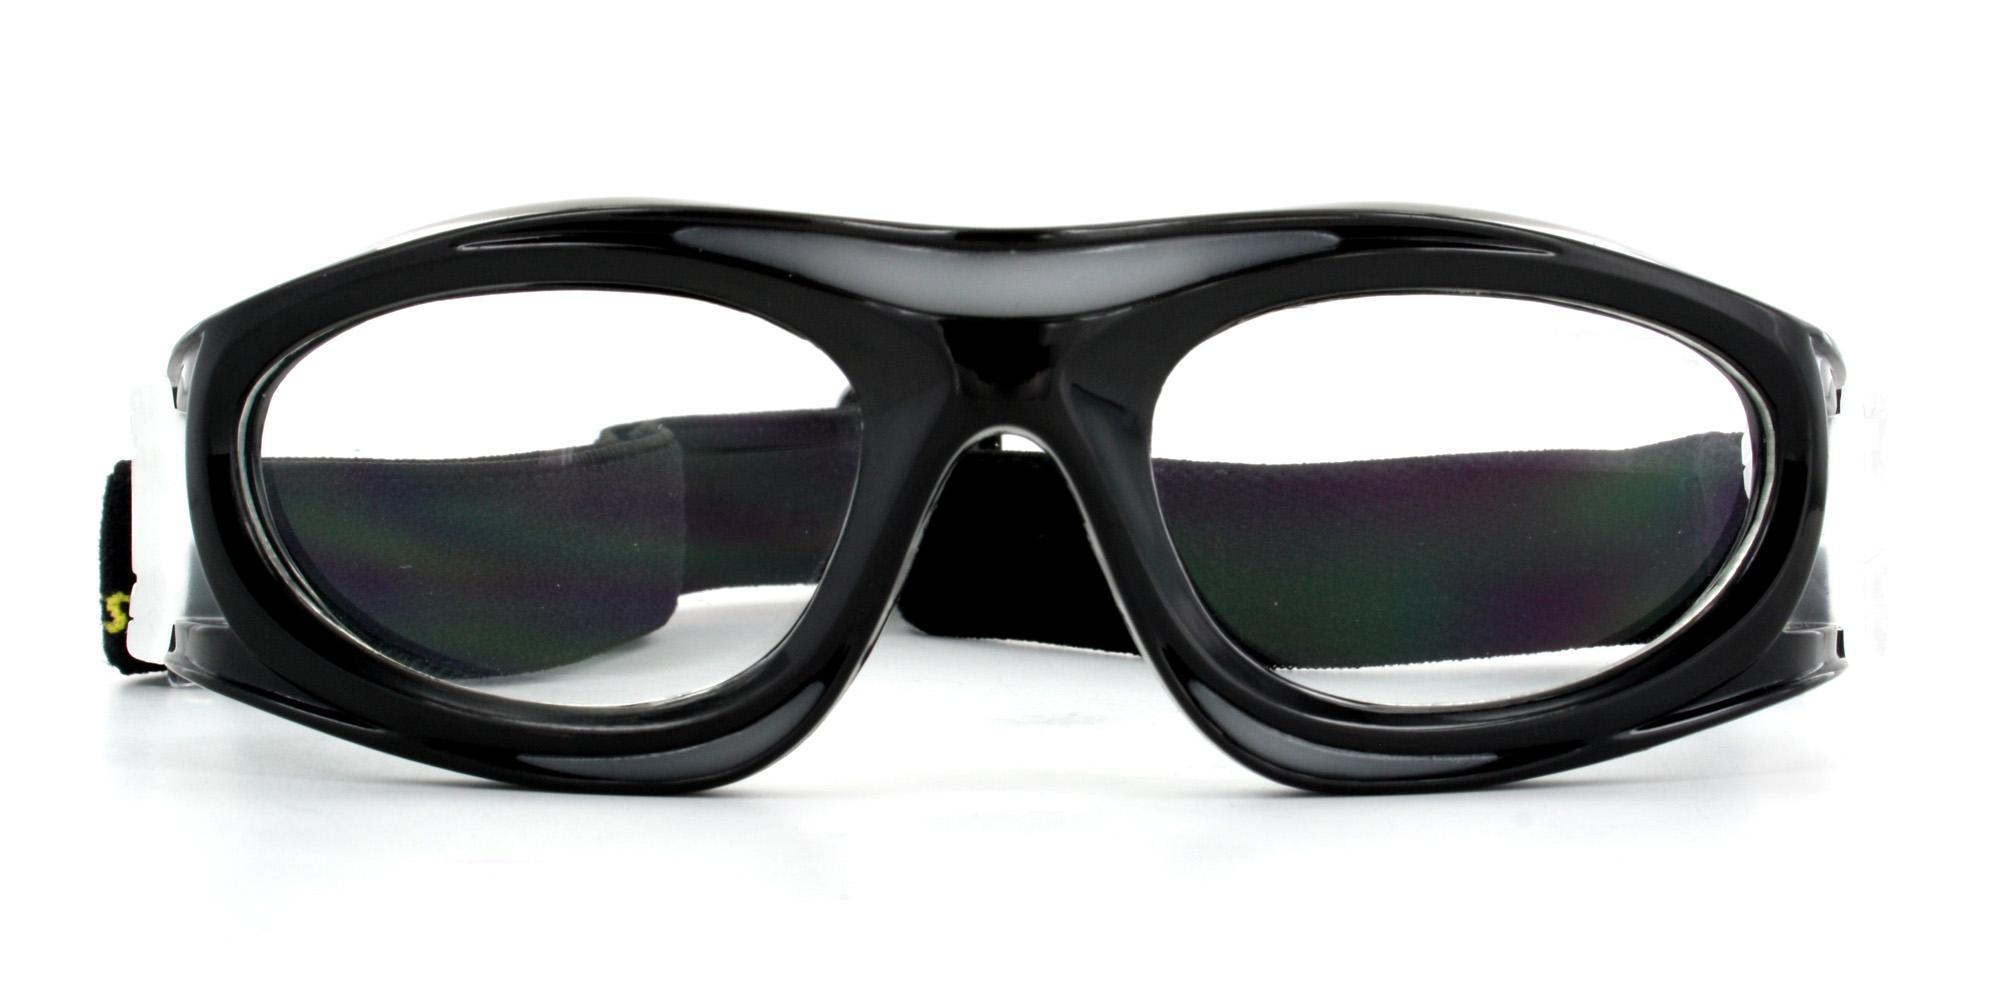 Black JH821 Sports Goggles, Aero